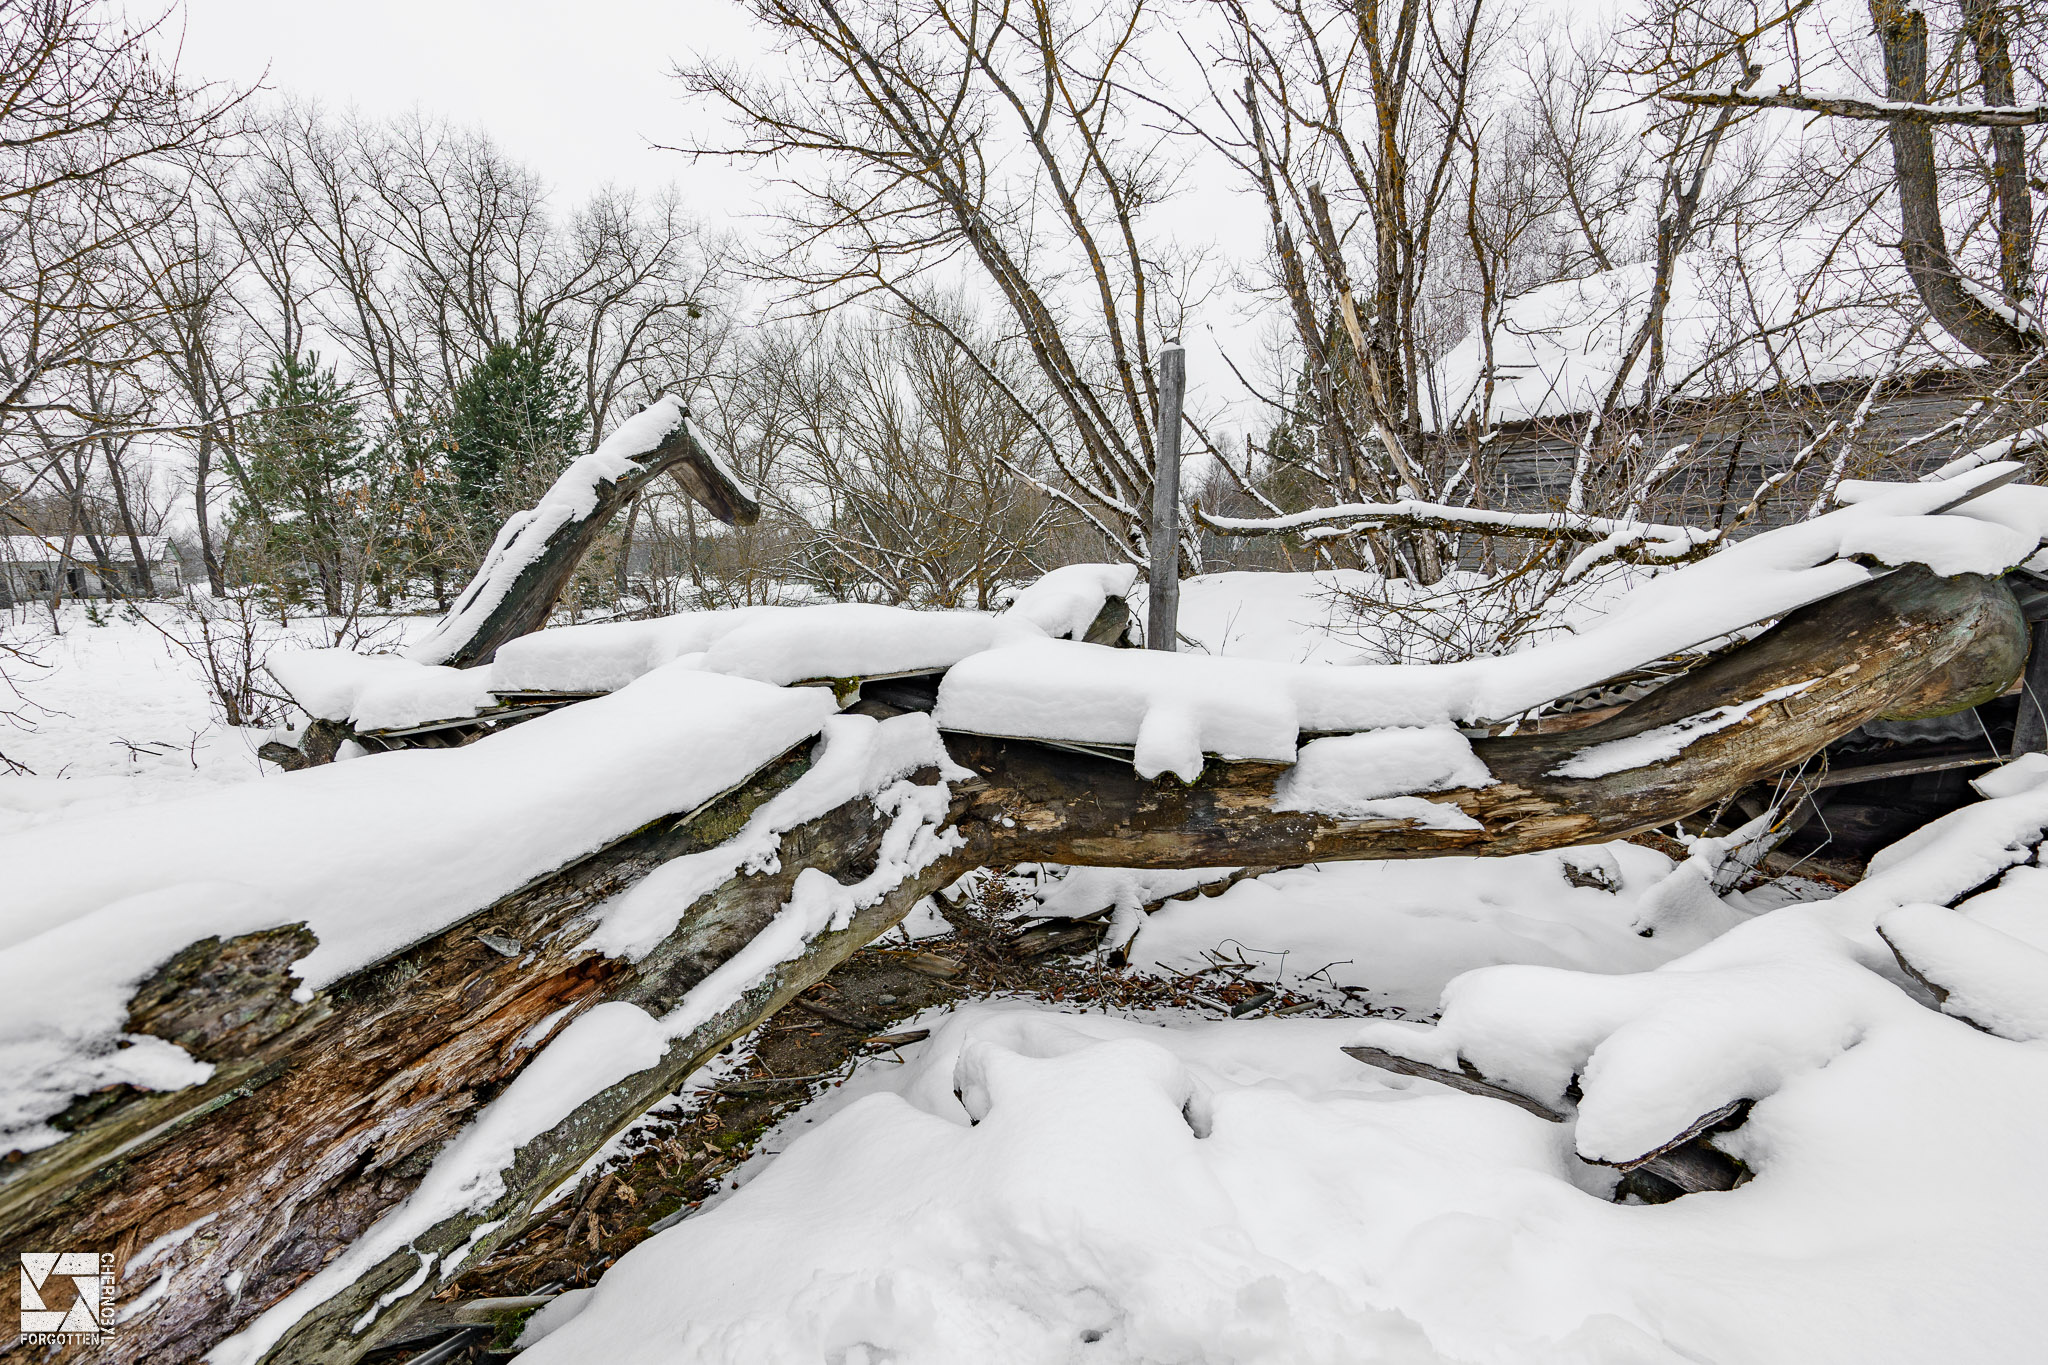 Chernobyl Savior Pine Cross